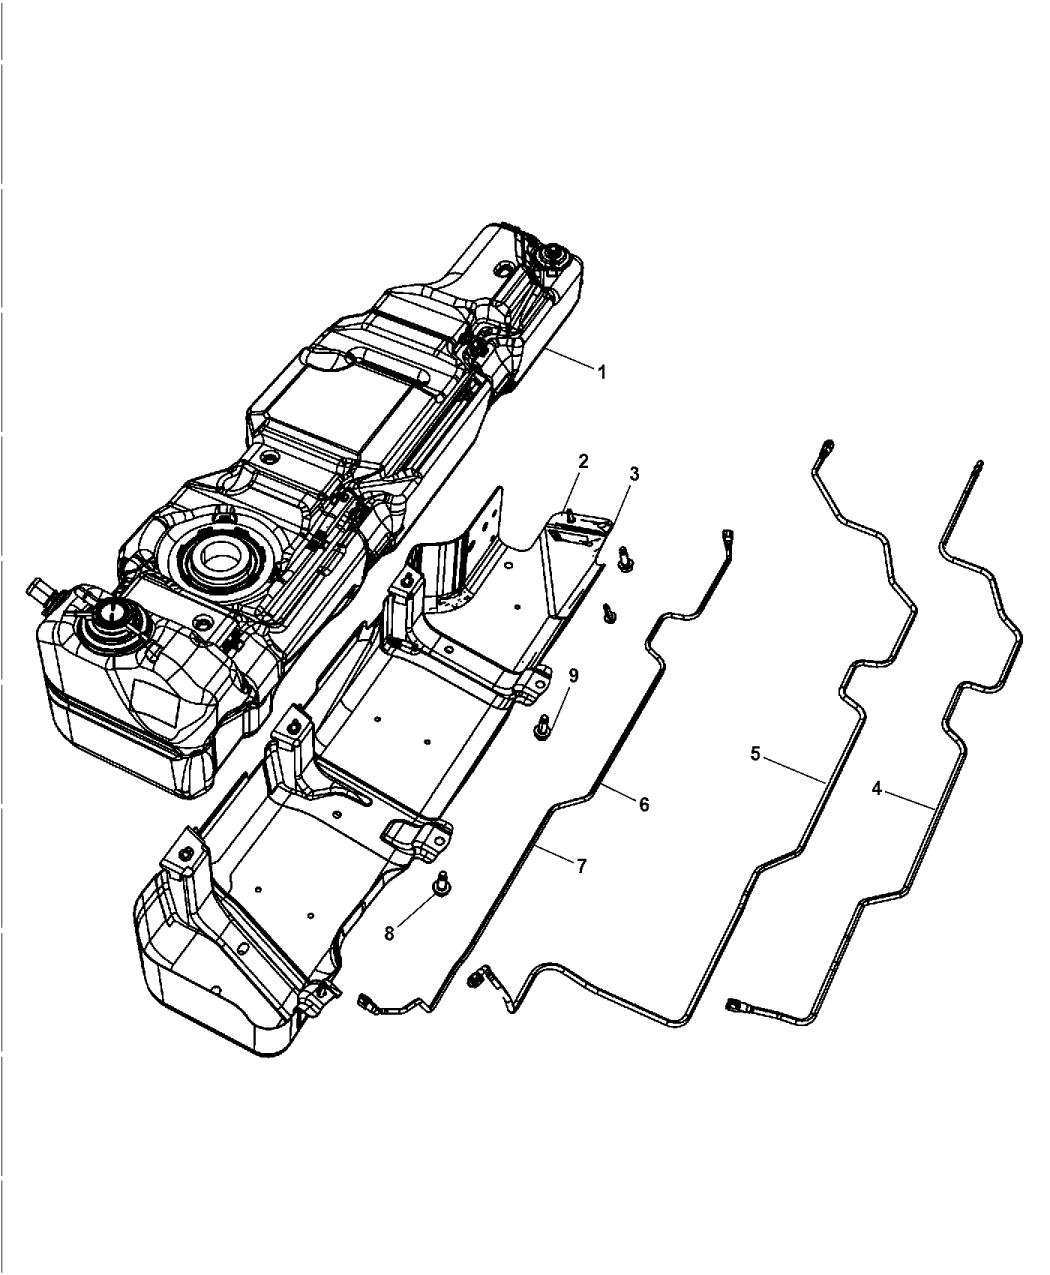 2007 Jeep Wrangler Fuel Tank